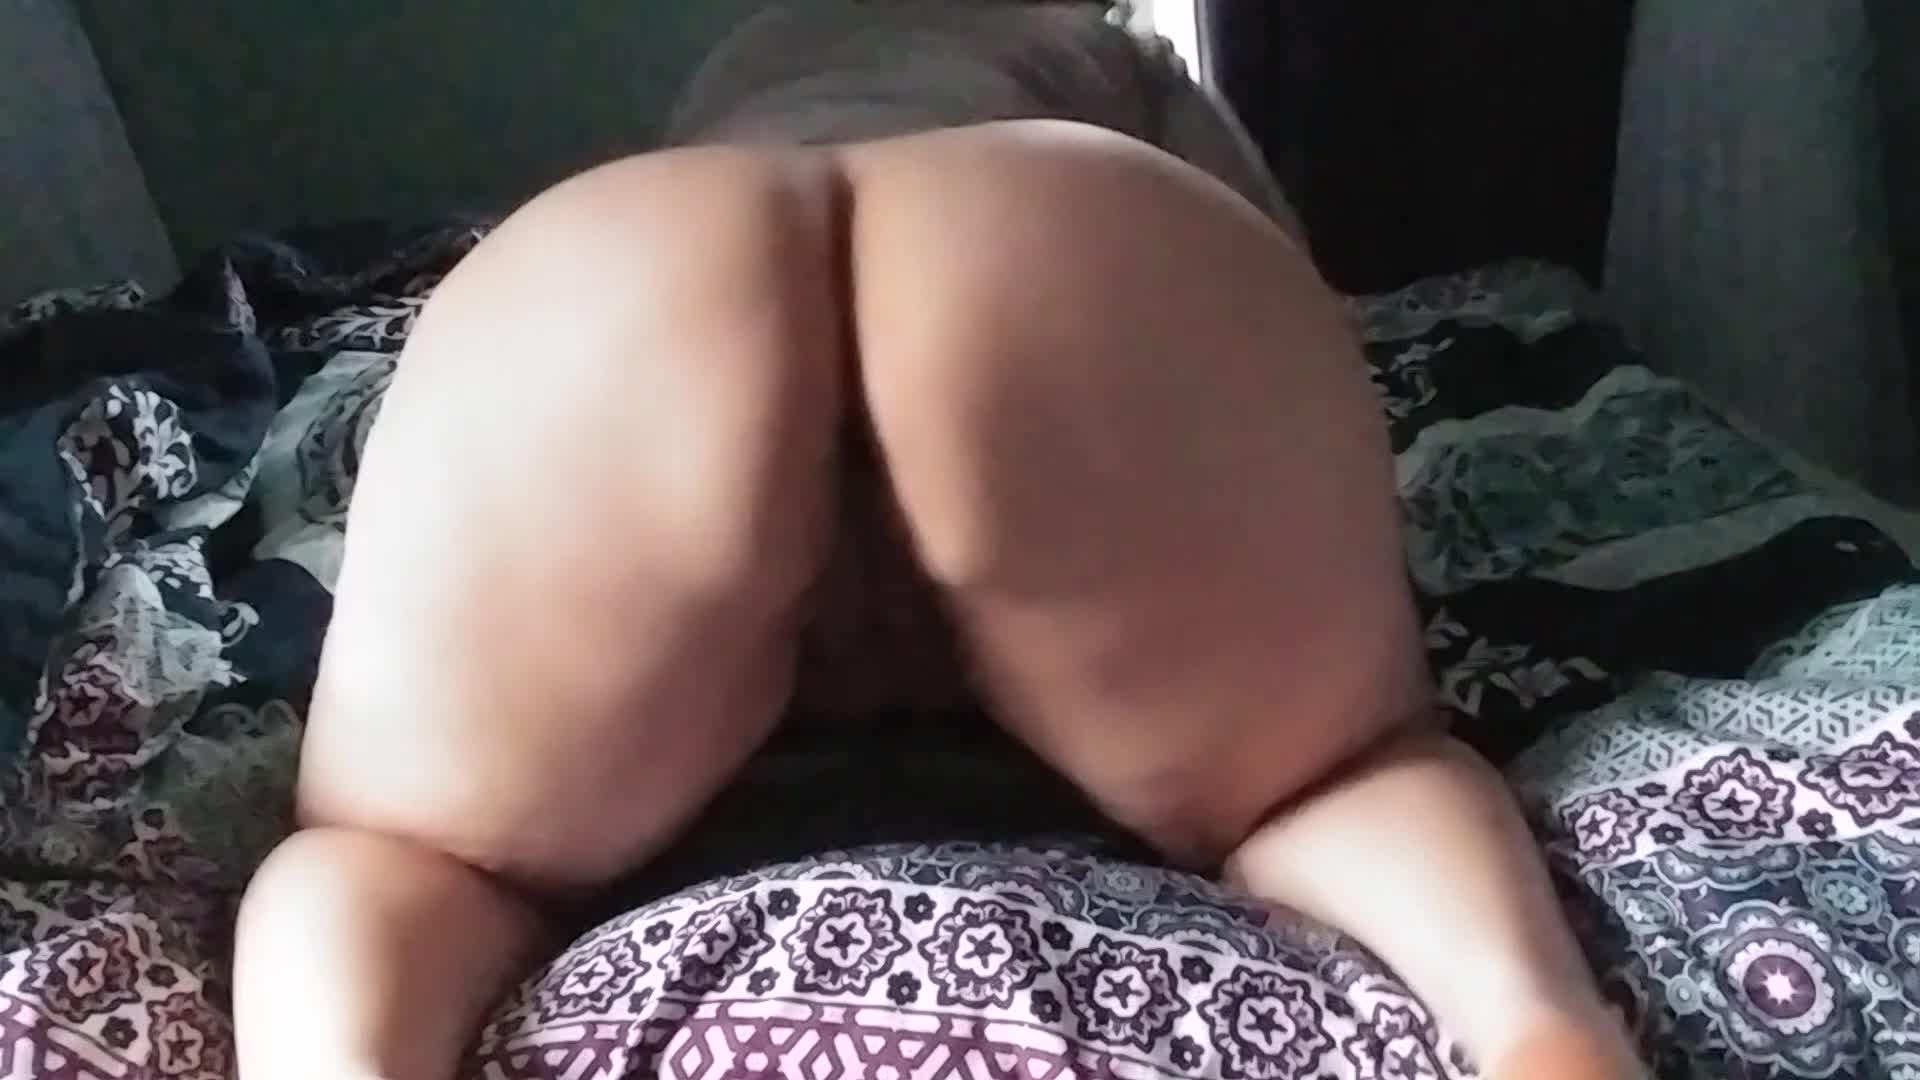 Big booty booty bouncing🍑